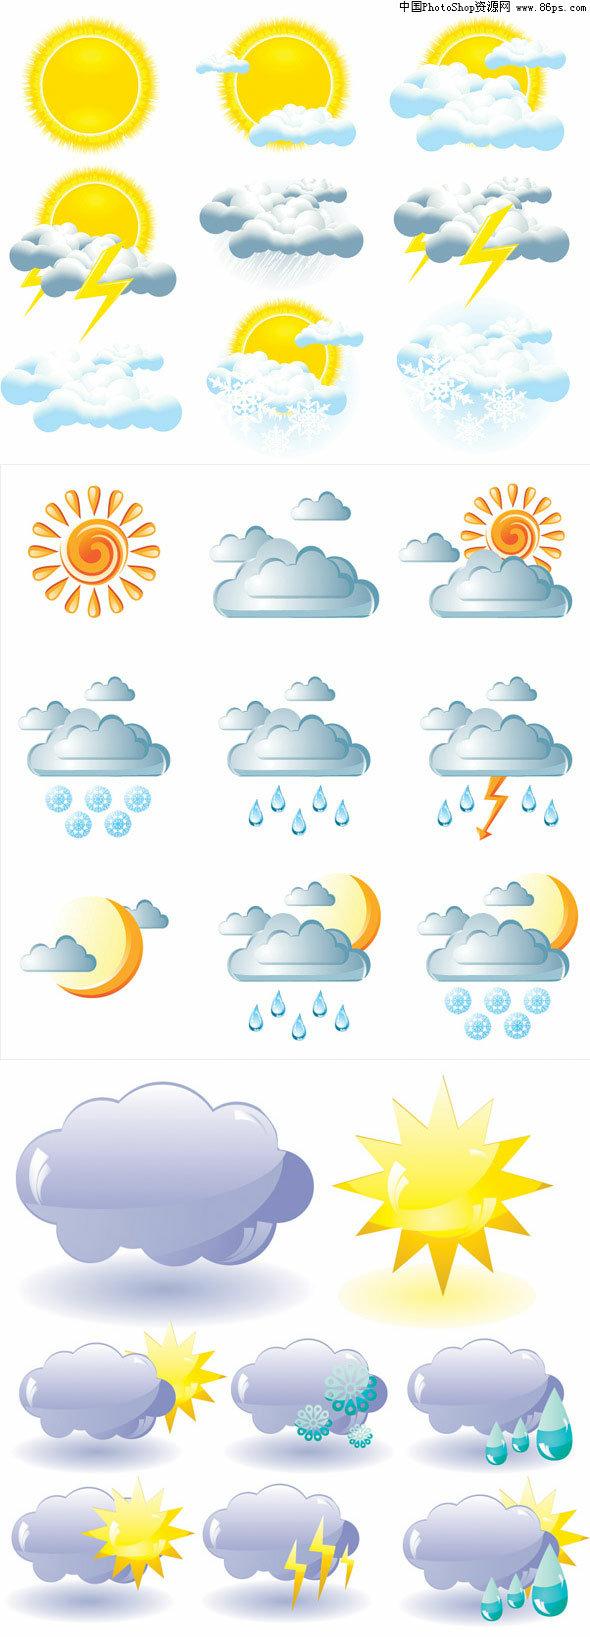 eps格式各种天气预报图标矢量素材免费下载